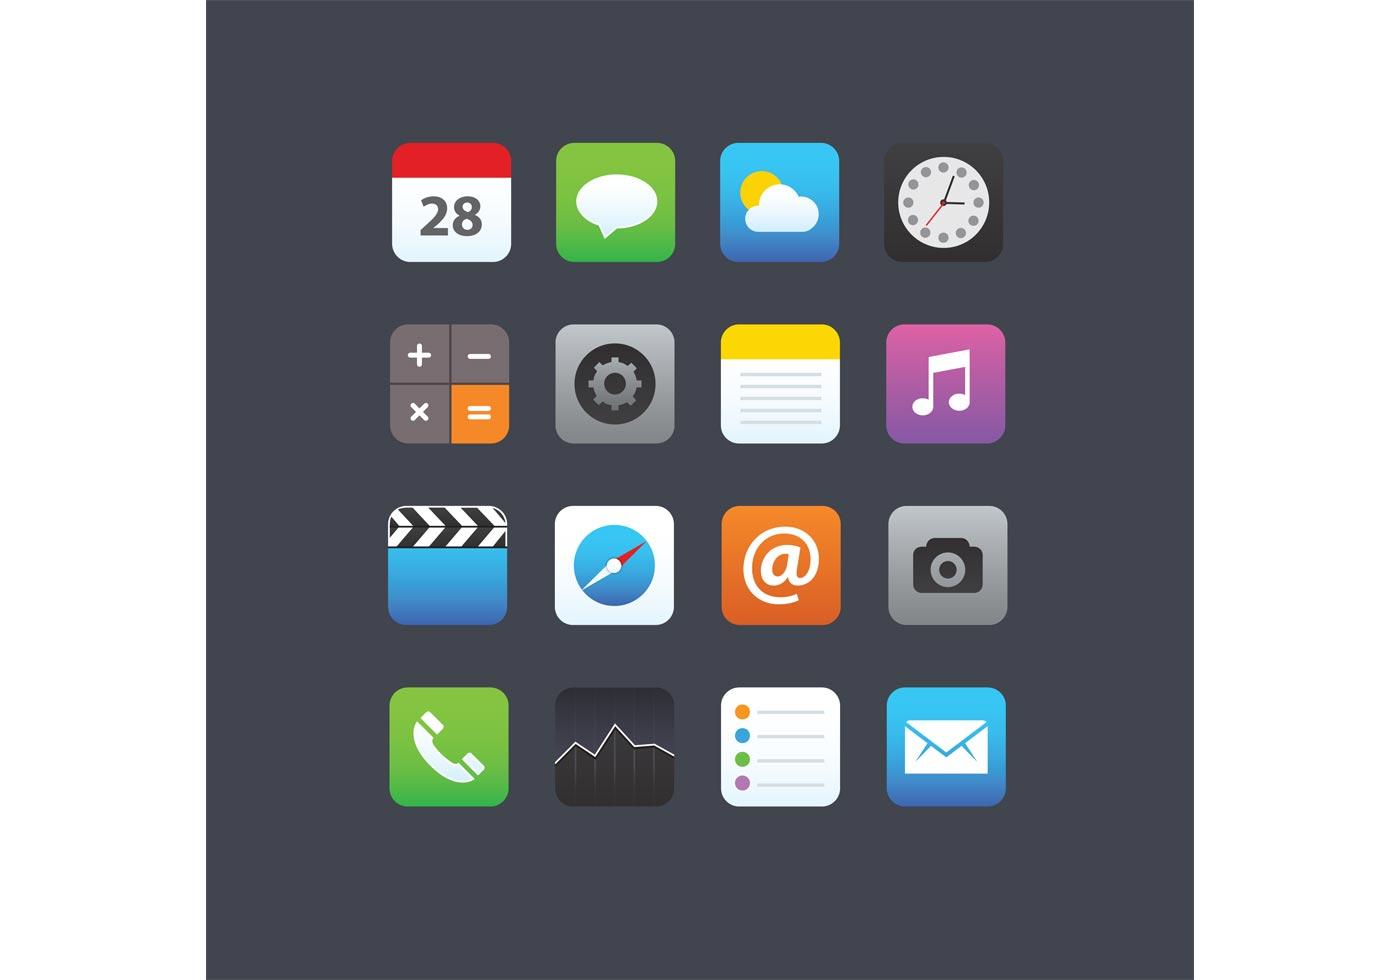 Smartphone App Icons - Download Free Vector Art, Stock ...